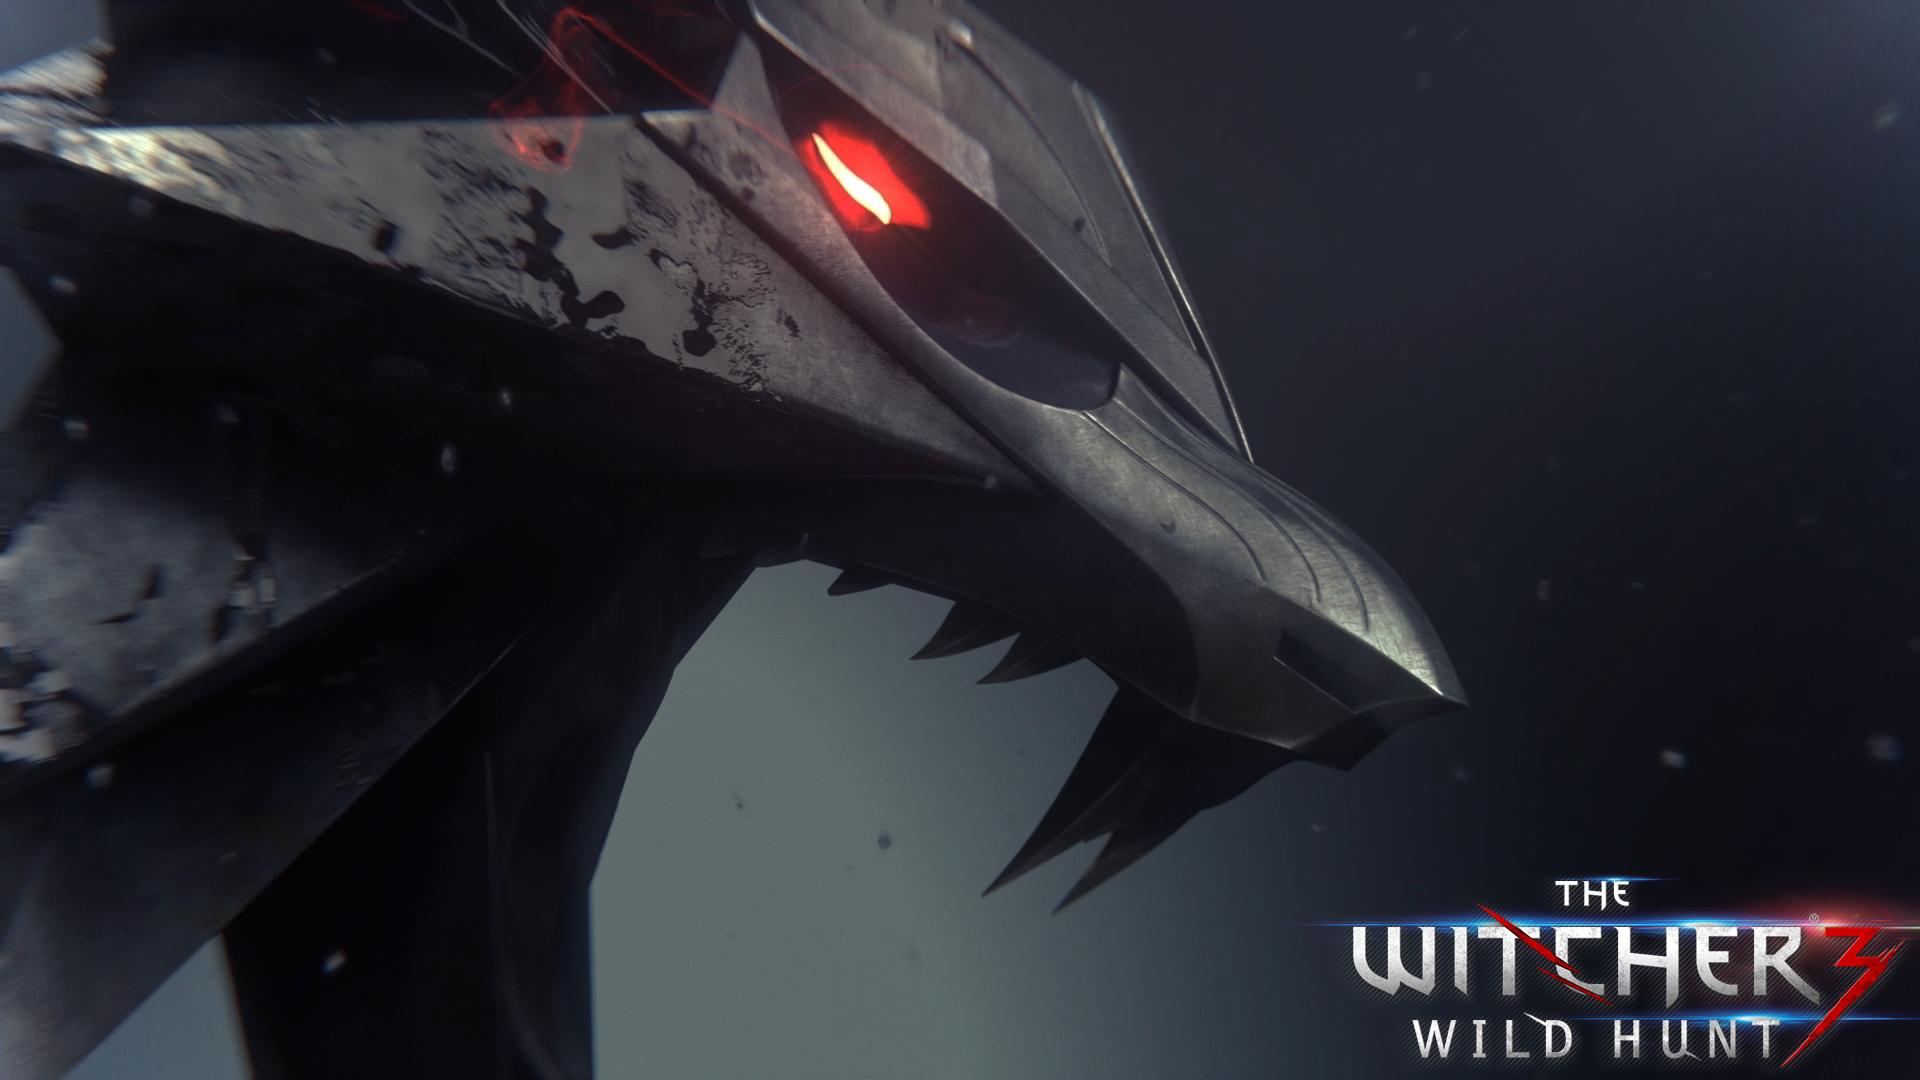 witcher 3 wild hunt game